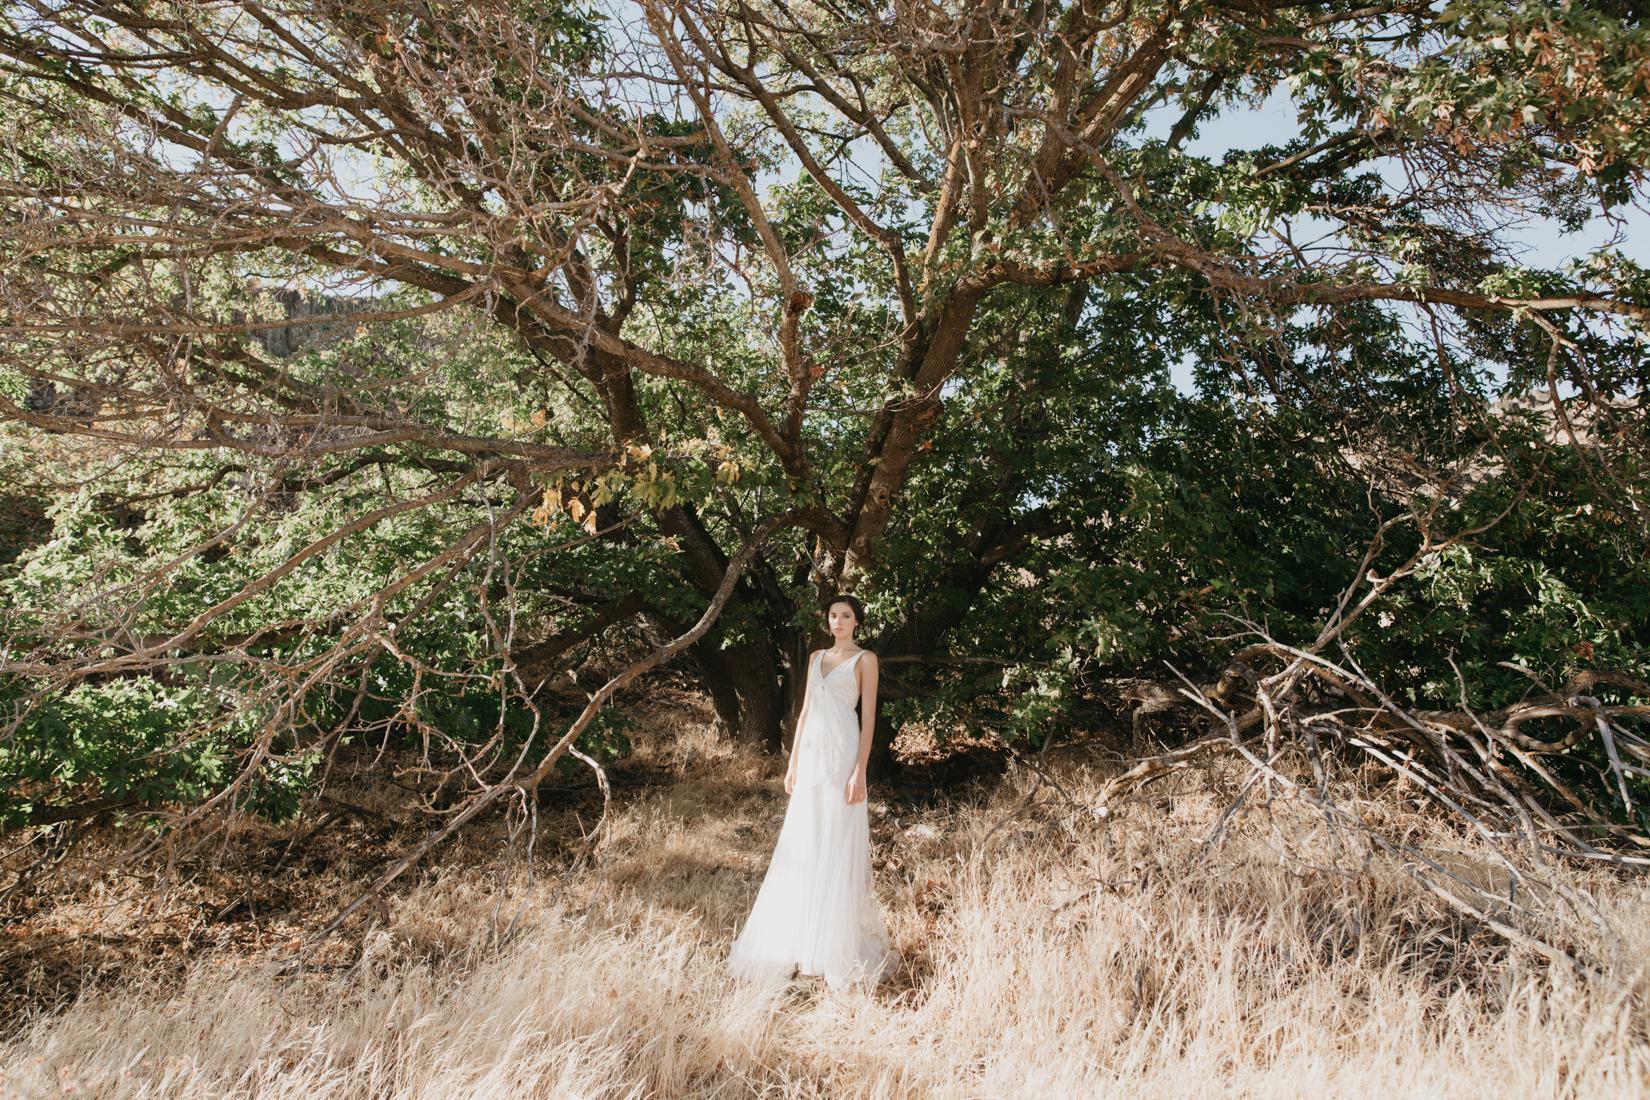 Bride in beautiful gown stands underneath massive tree in Oregon desert